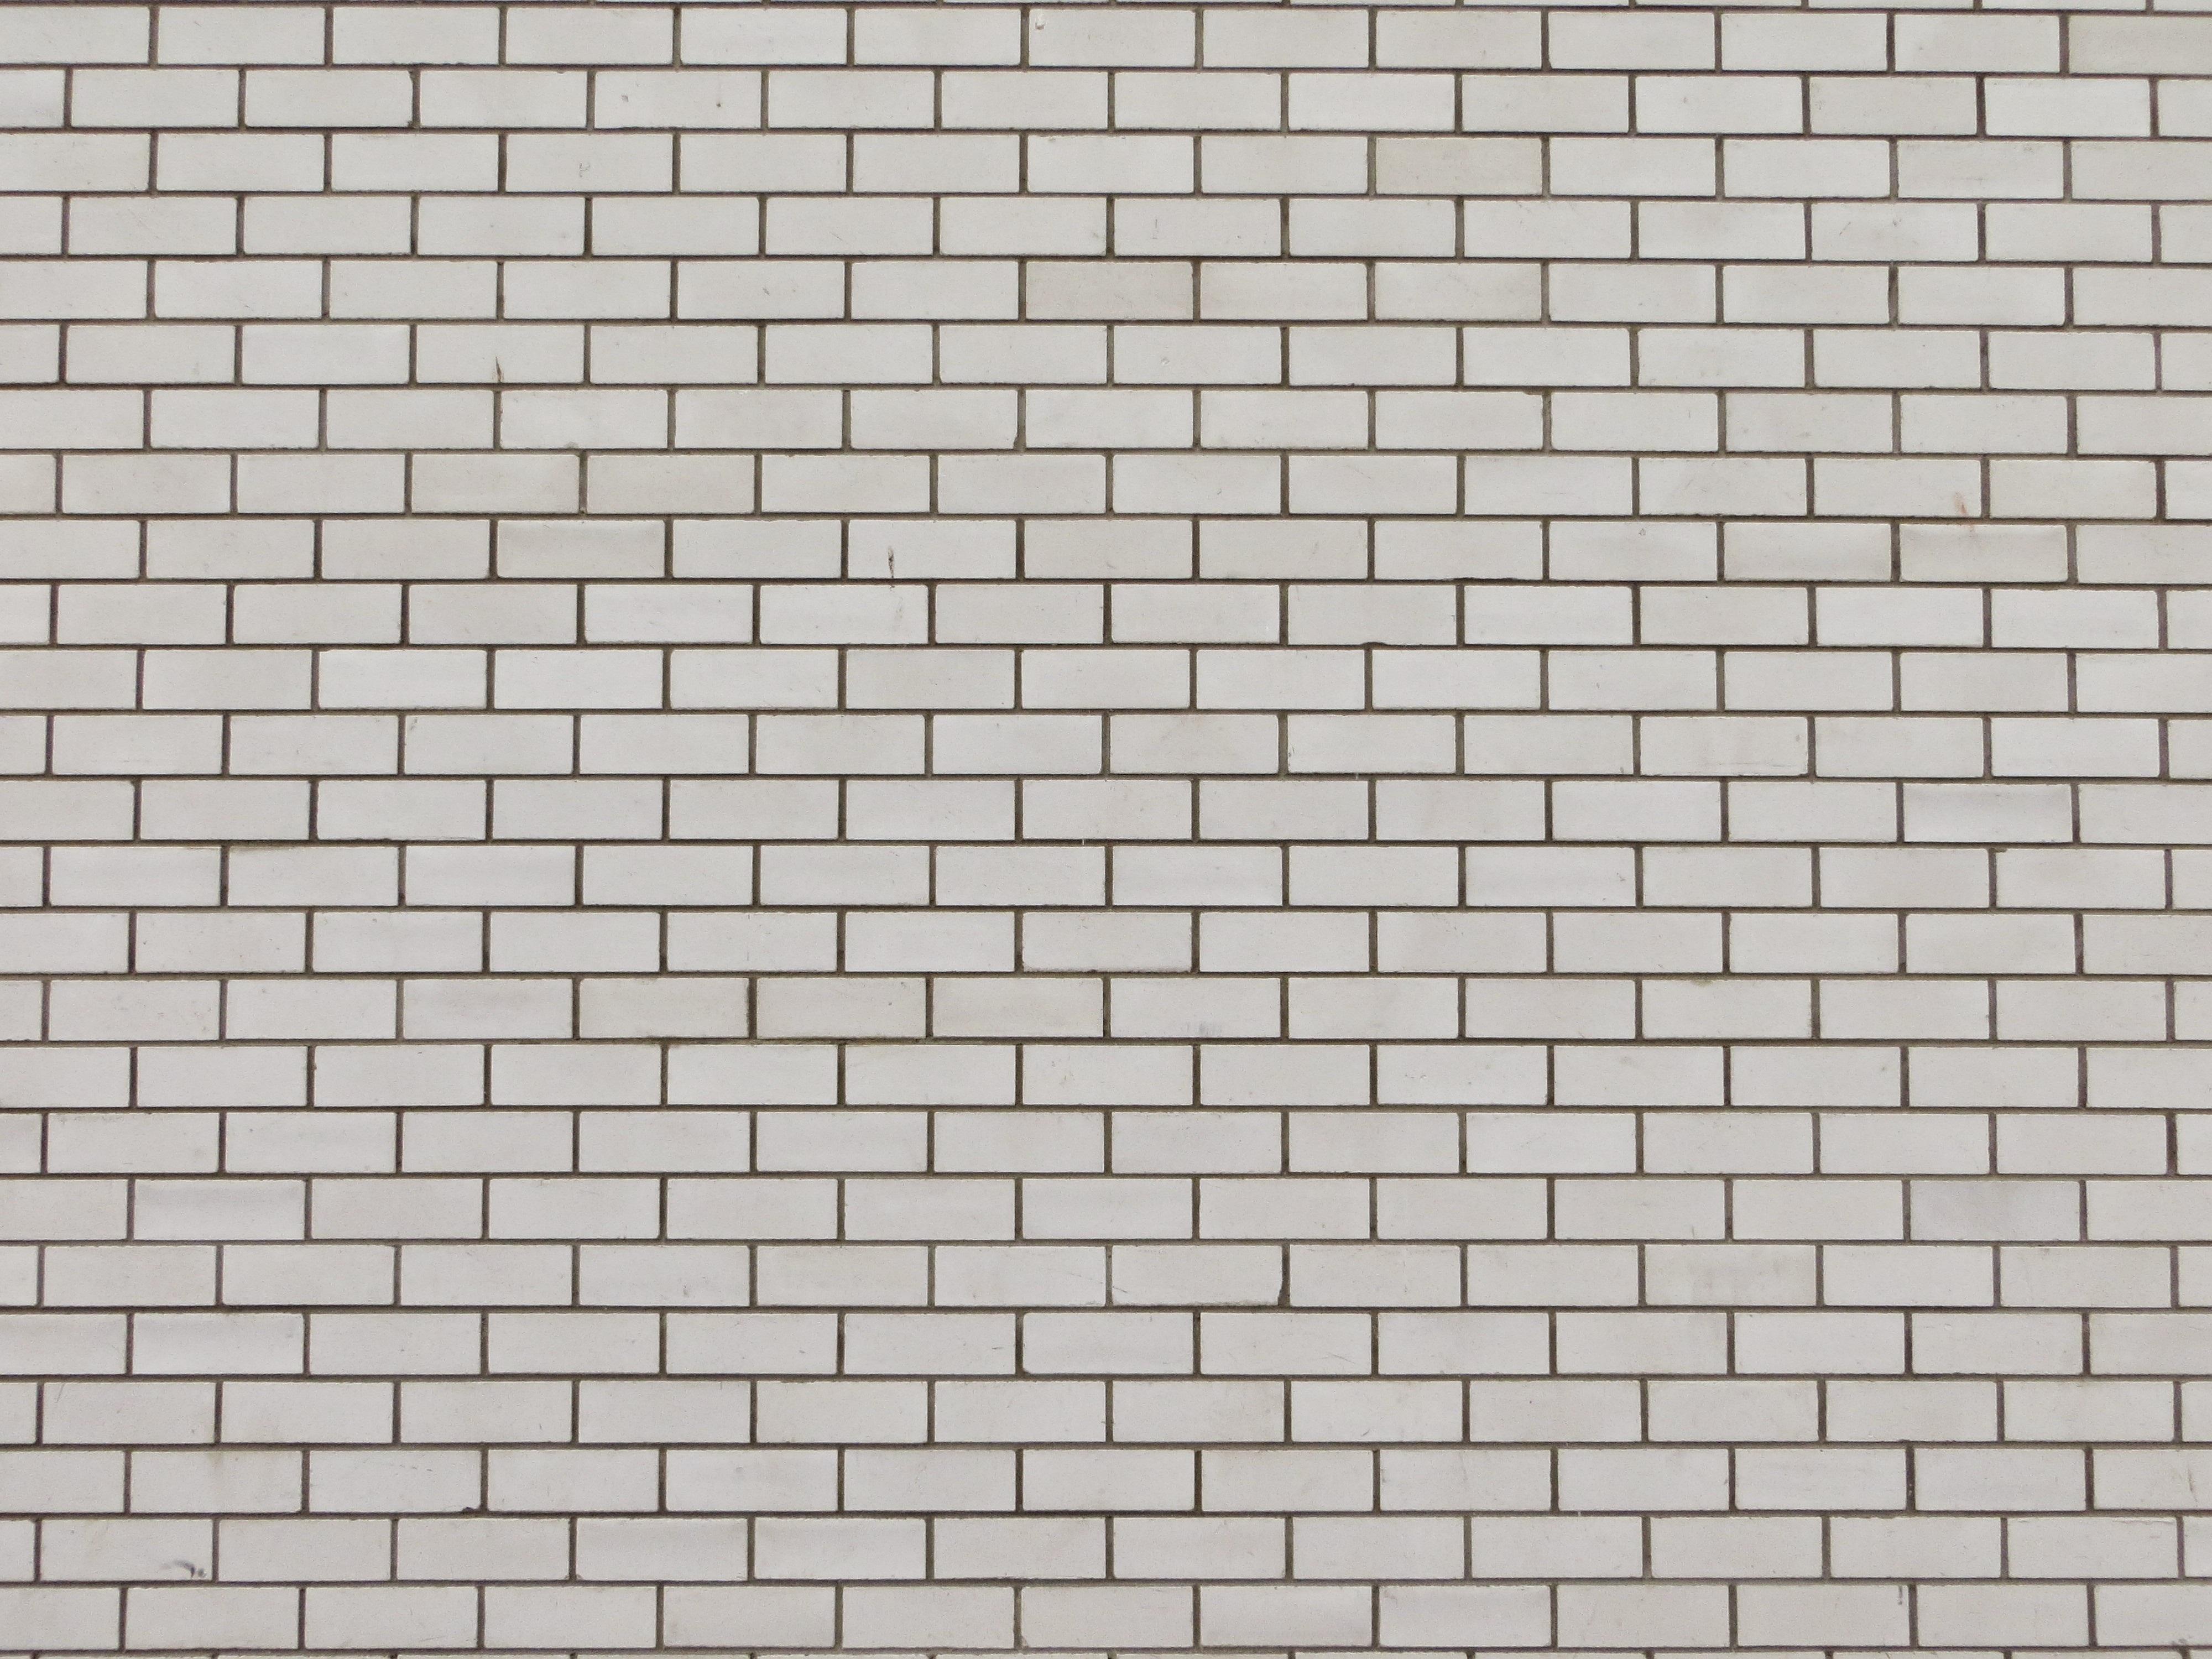 White Texture Floor Wall Stone Tile Brick Material Bricks Brickwork Flooring